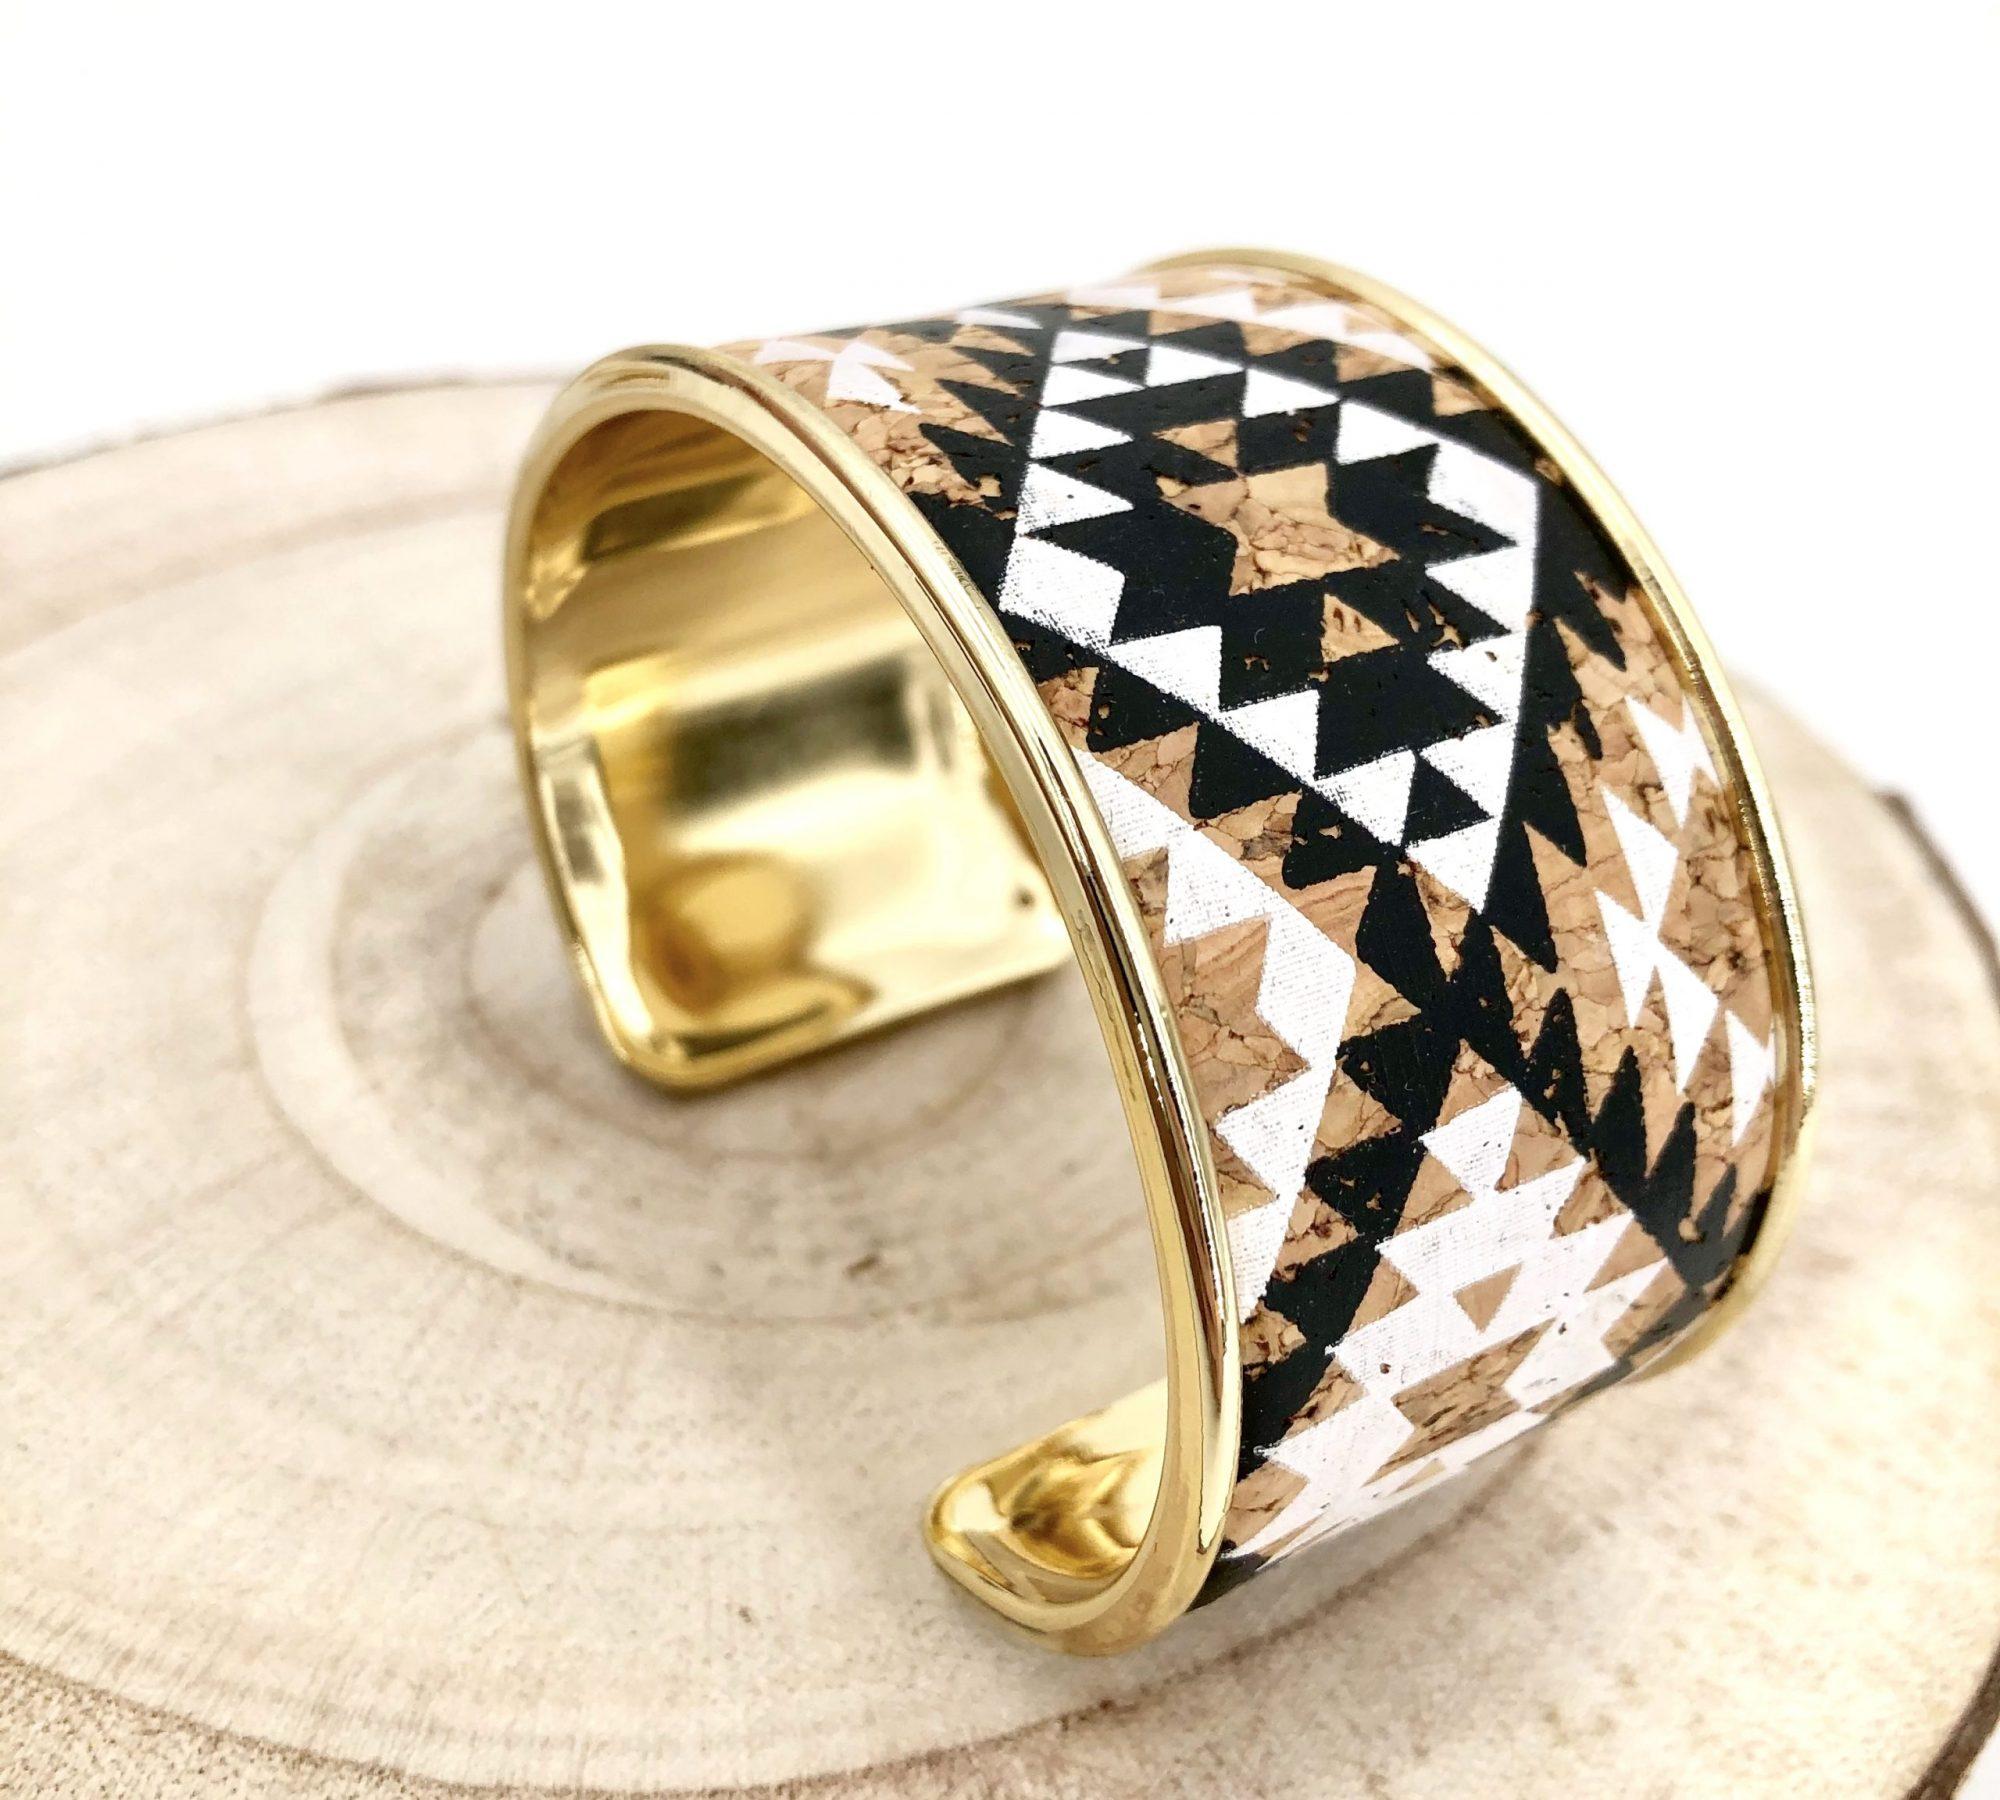 bracelet vegan - manchette vegan - bracelet manchette vegan - bijou vegan - bracelet ecoresponsable - bracelet ethique - bracelet responsable - bracelet liege - bracelet pinatex - pumskin